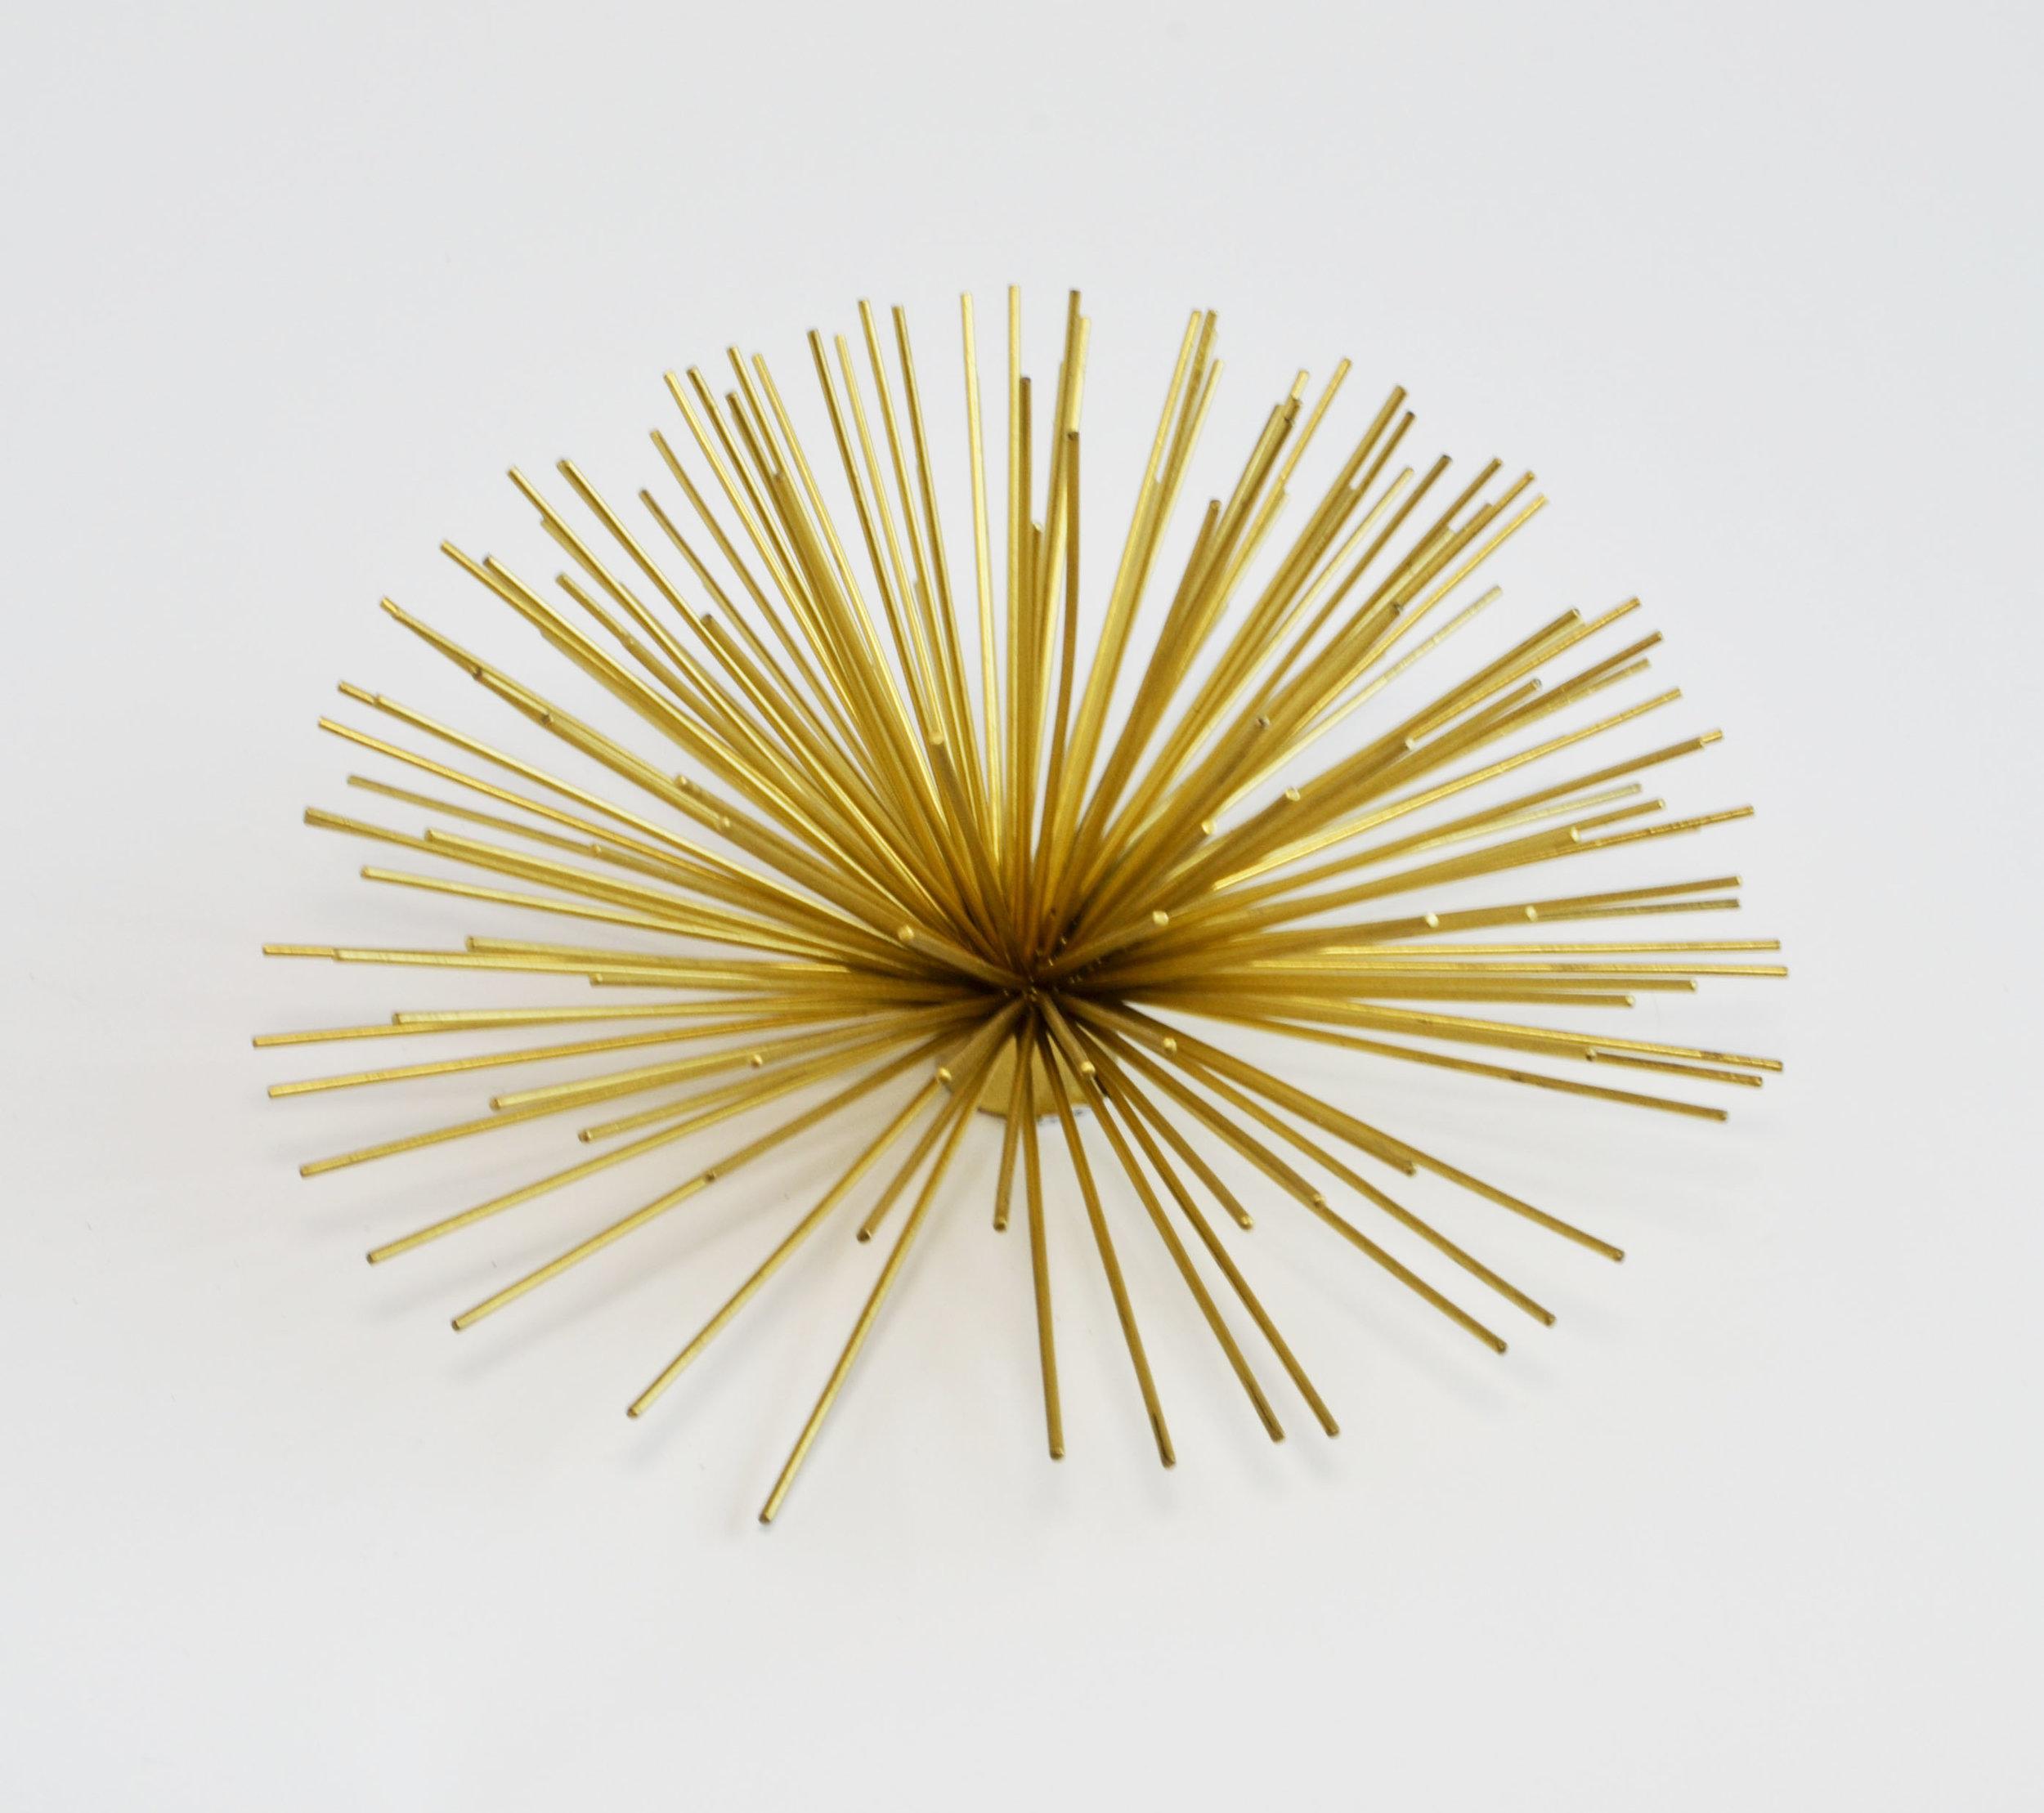 sea urchin - gold decor (large)   Quantity: 15  Price: $6.50